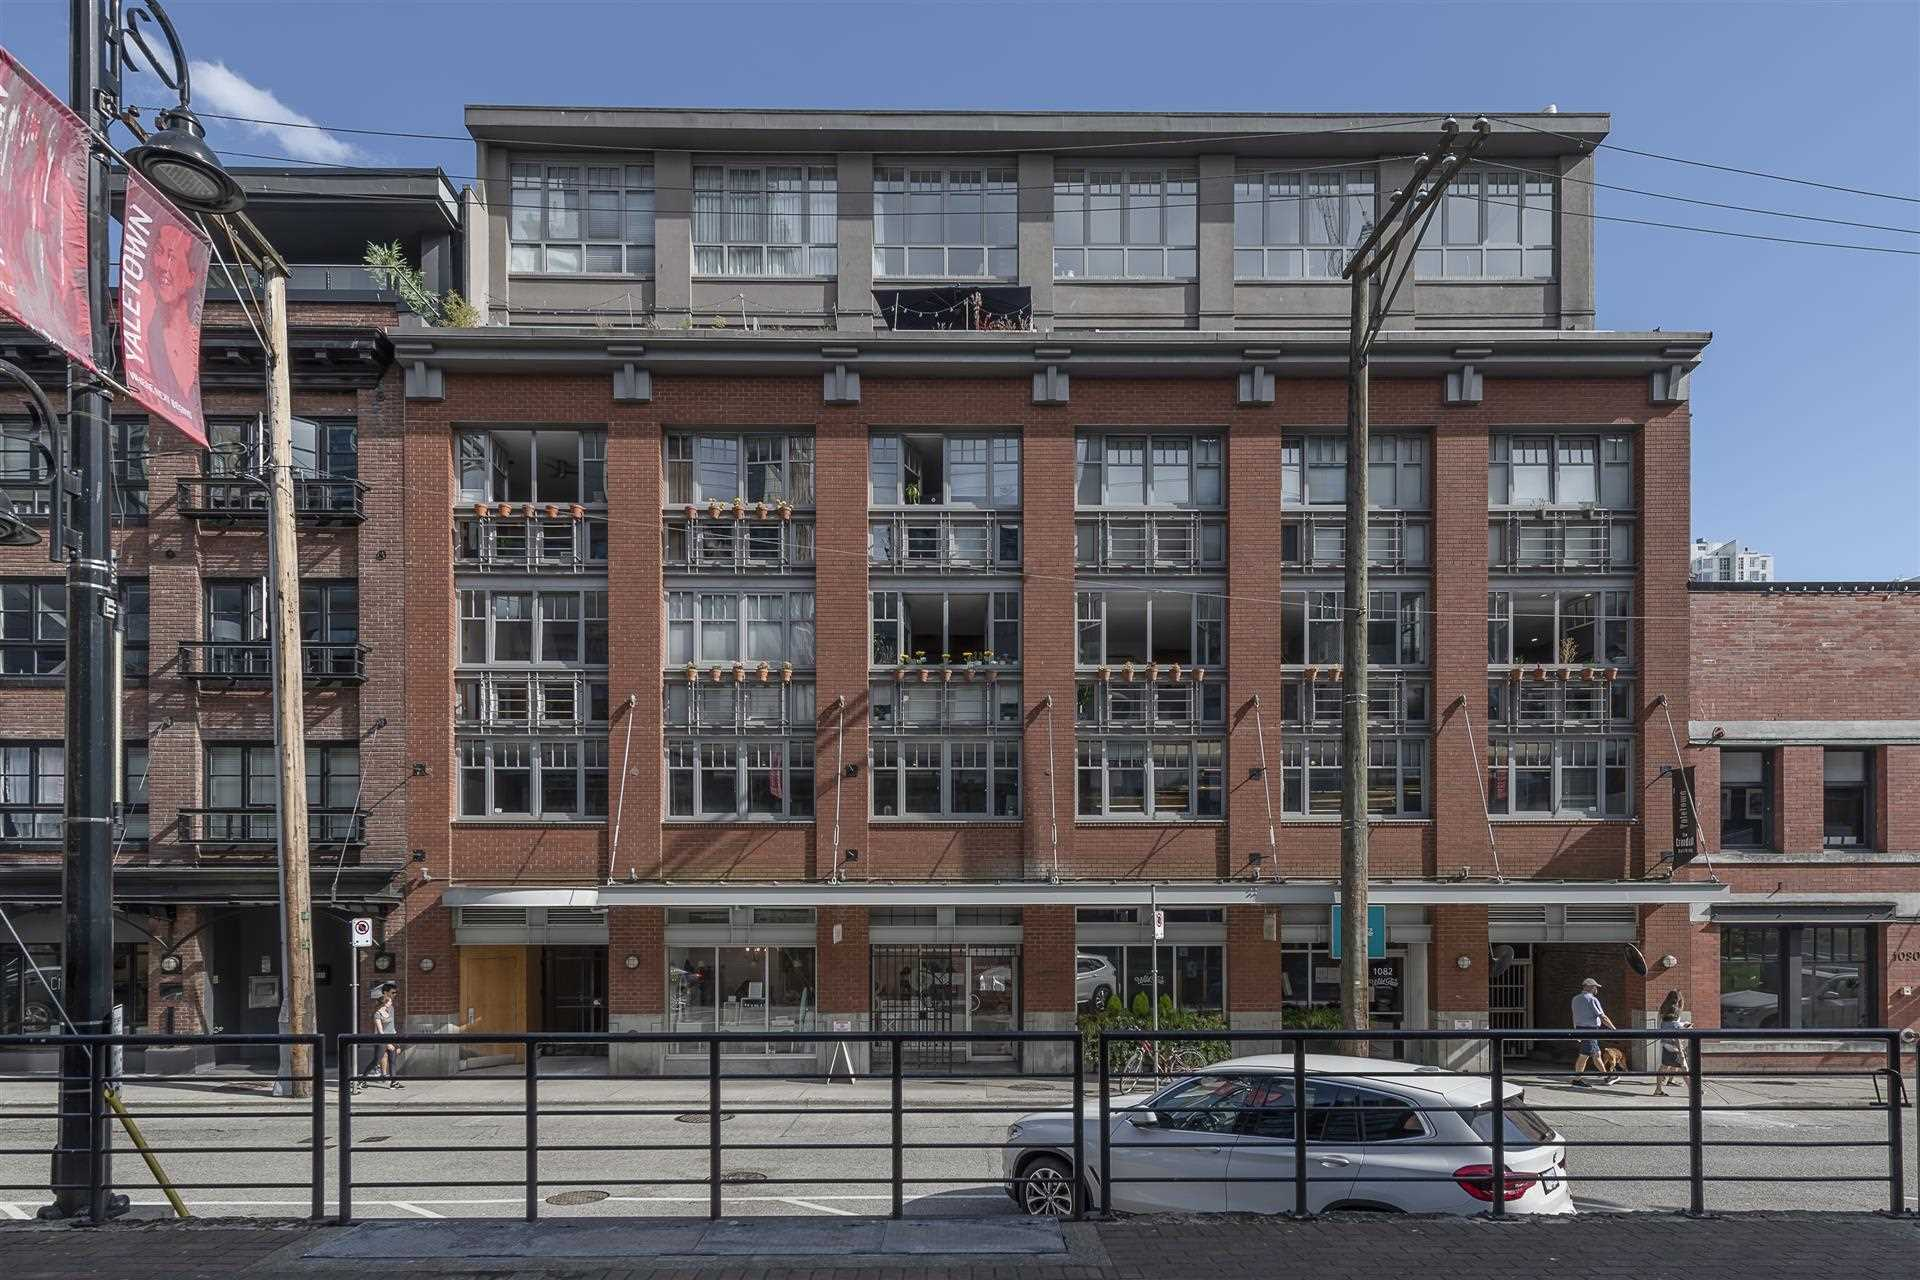 308 1072 HAMILTON STREET - Yaletown Apartment/Condo for sale, 1 Bedroom (R2603481) - #1